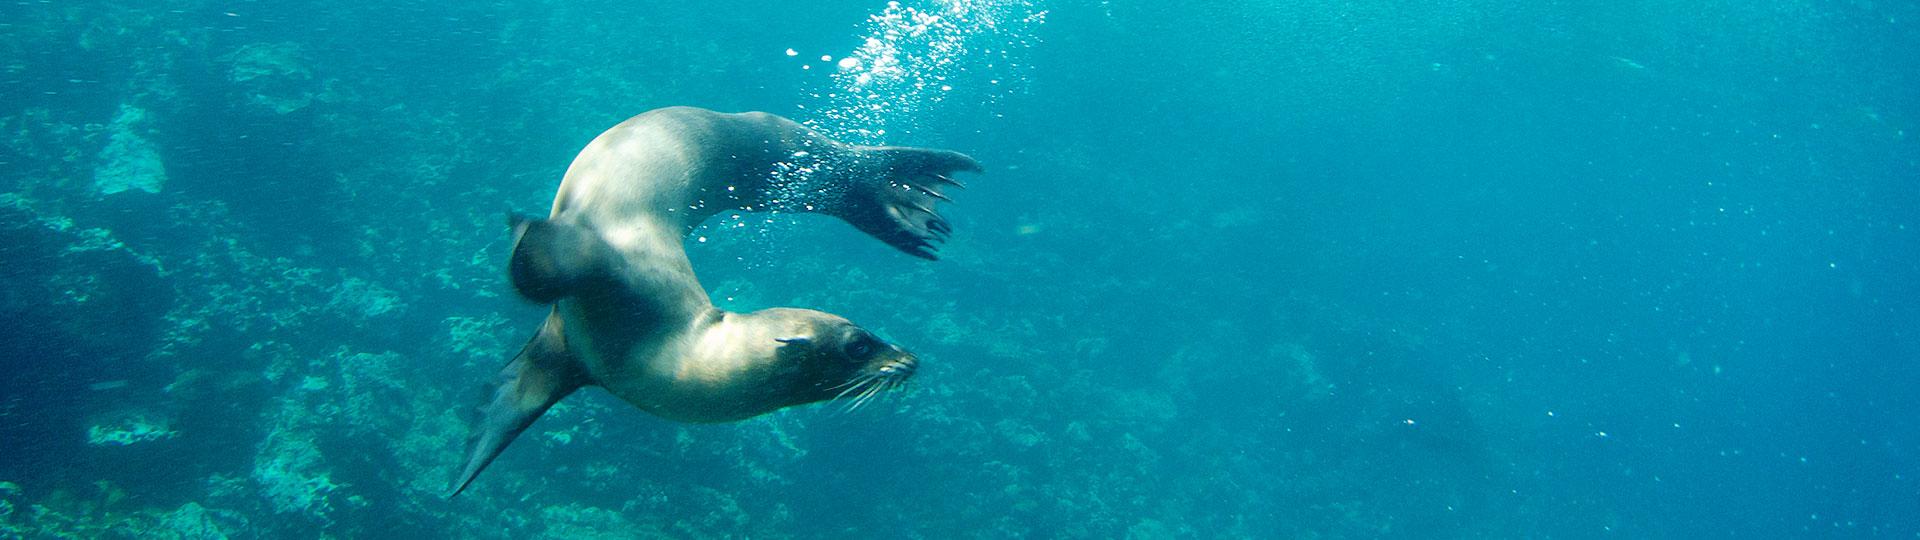 Aquarium of Honolulu, Hawaii Hotel